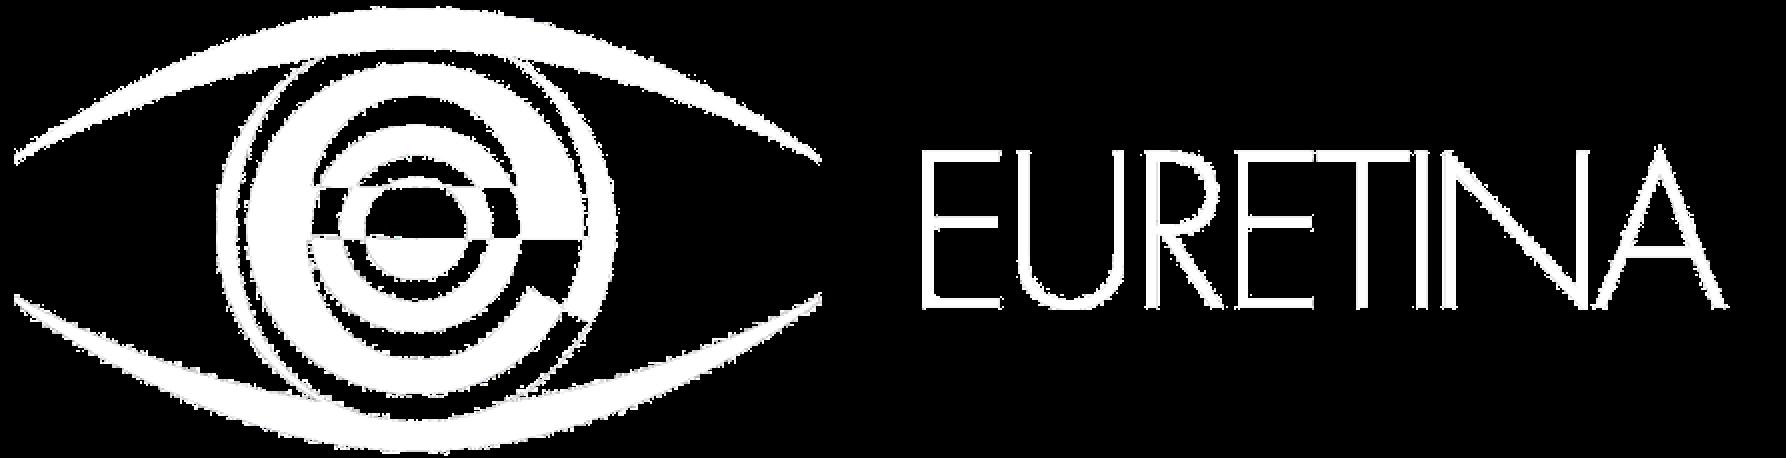 EURETINA Logo